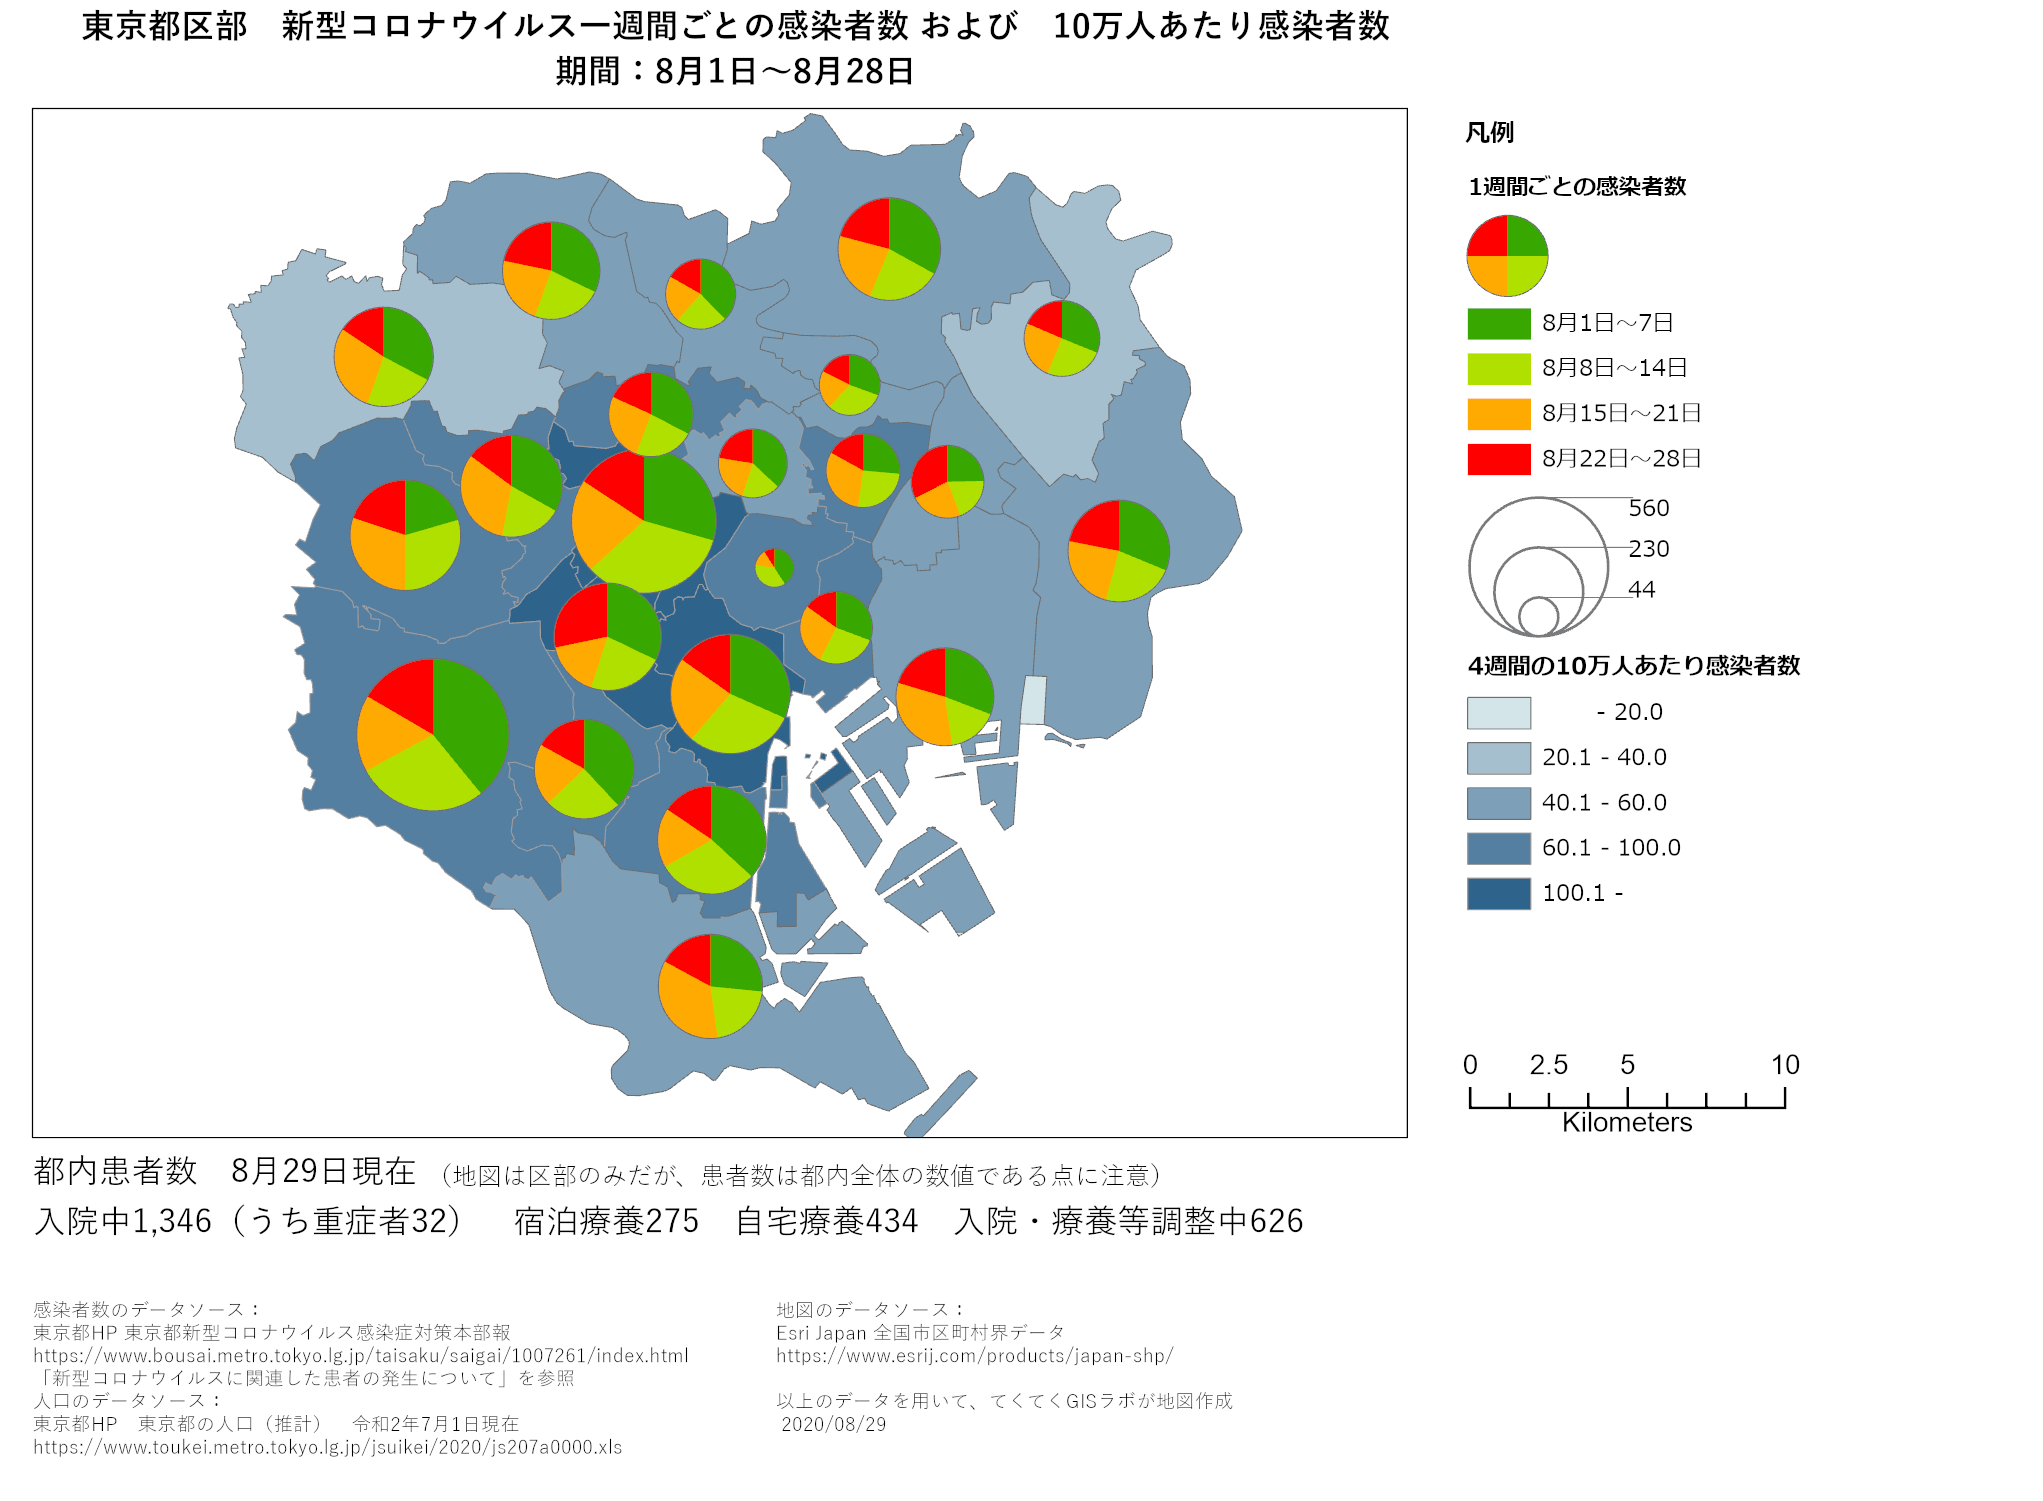 1週間ごと感染者数、東京都、8月1日〜28日